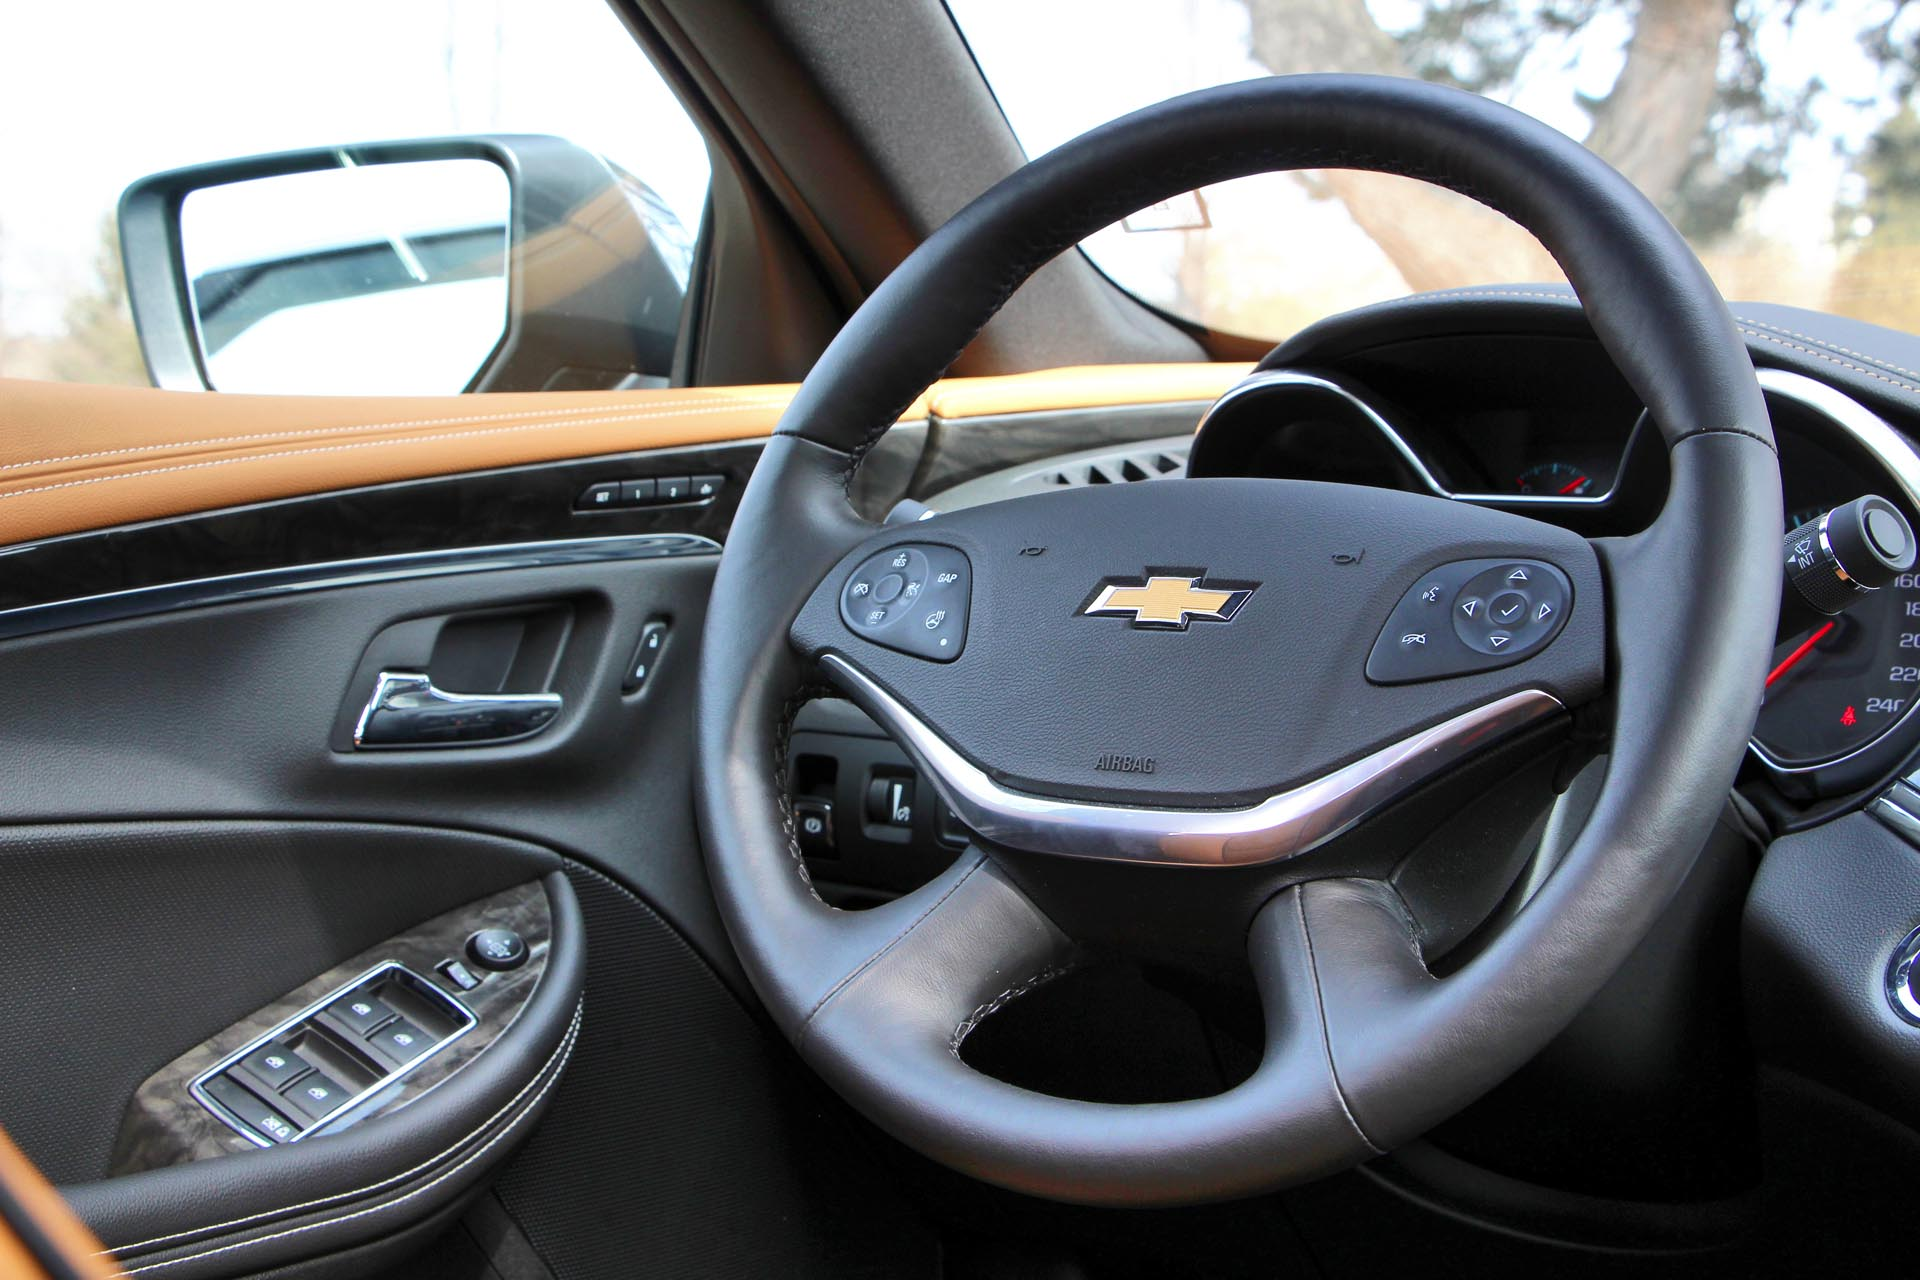 2015 chevrolet impala ltz test drive review. Black Bedroom Furniture Sets. Home Design Ideas